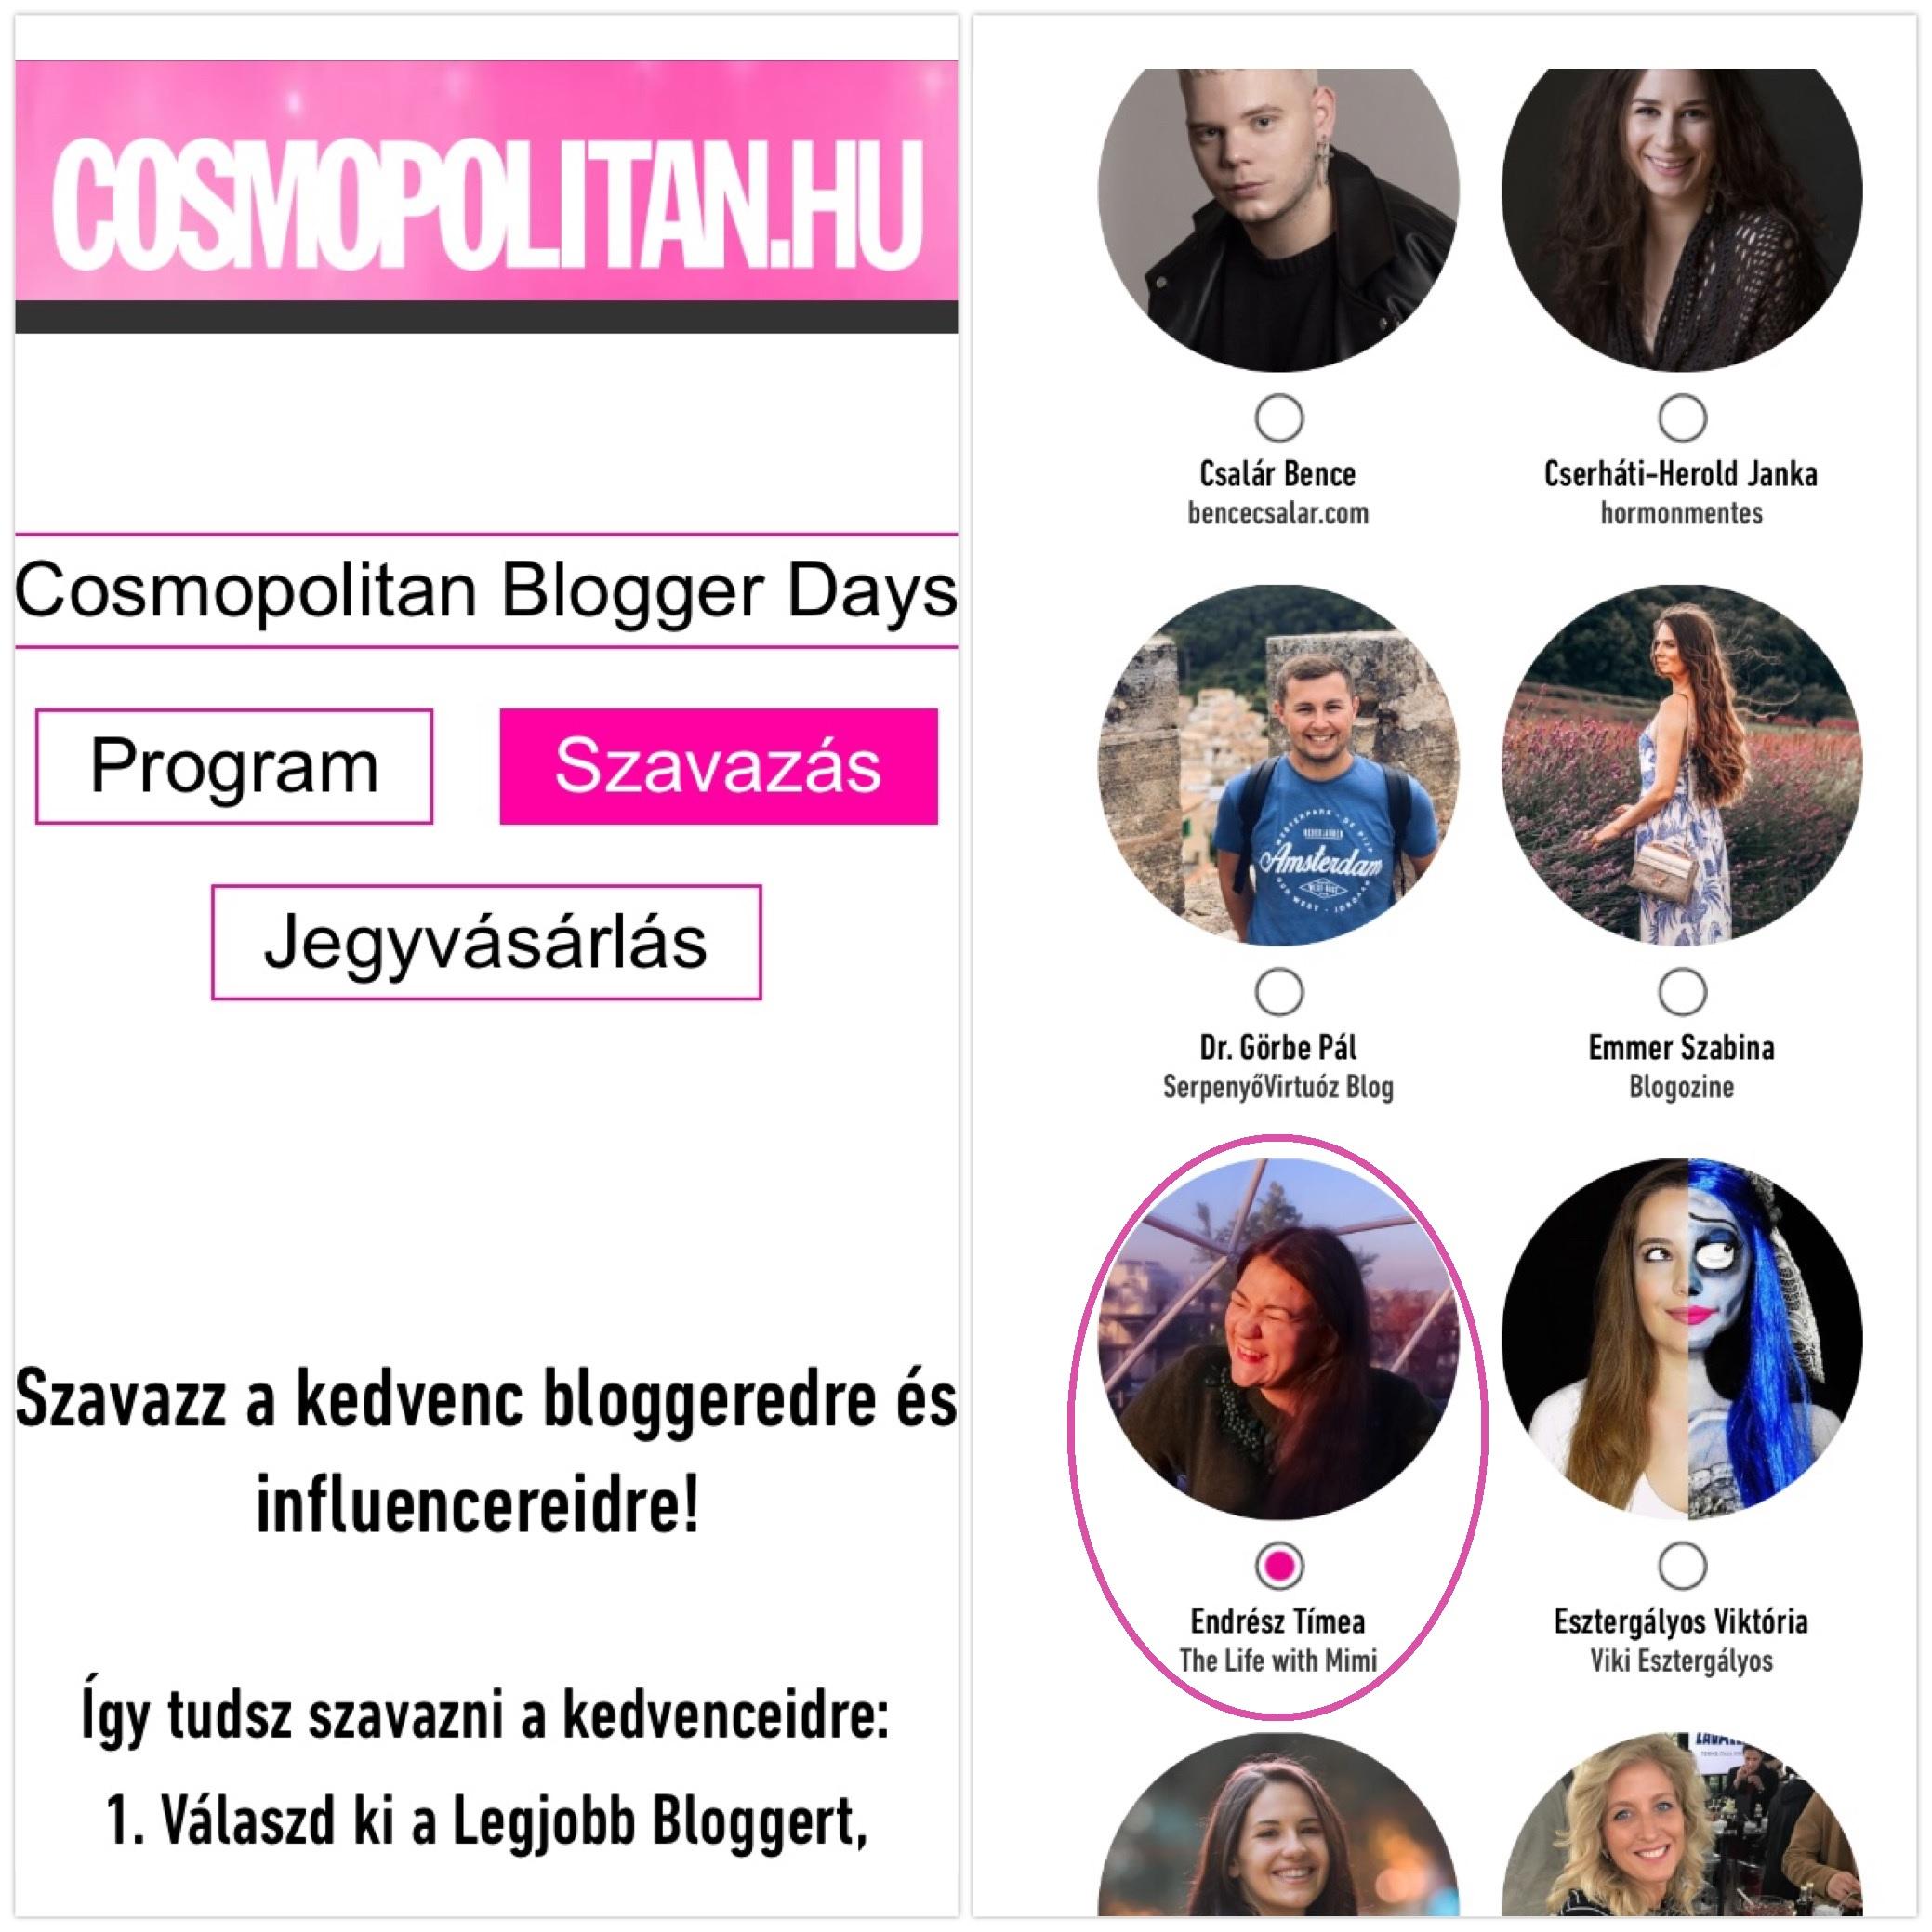 cosmopolitan_blogger_days_szavazas.jpg